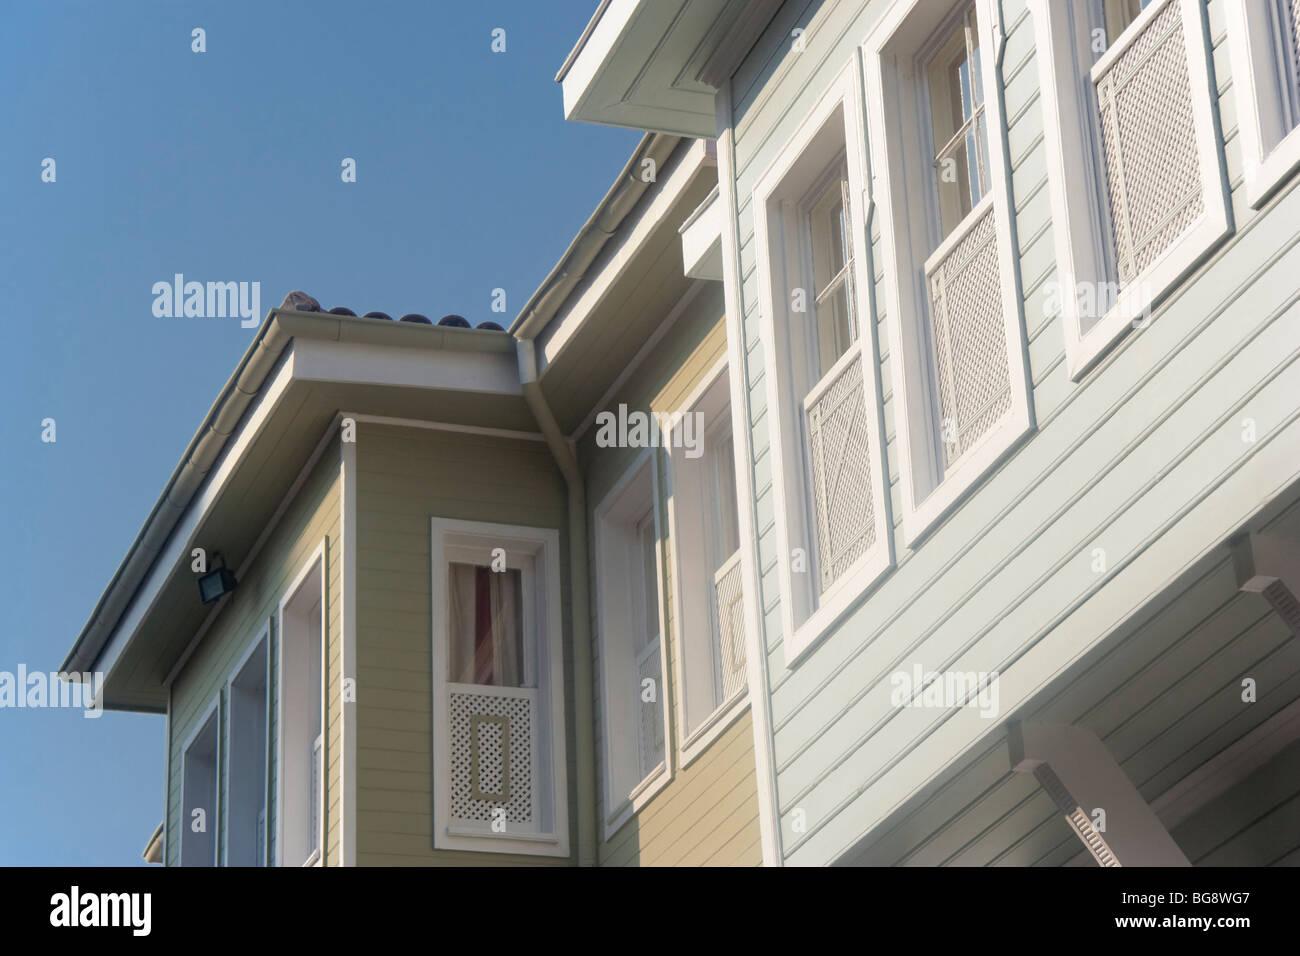 Modern Terraced Stockfotos & Modern Terraced Bilder - Seite 18 - Alamy